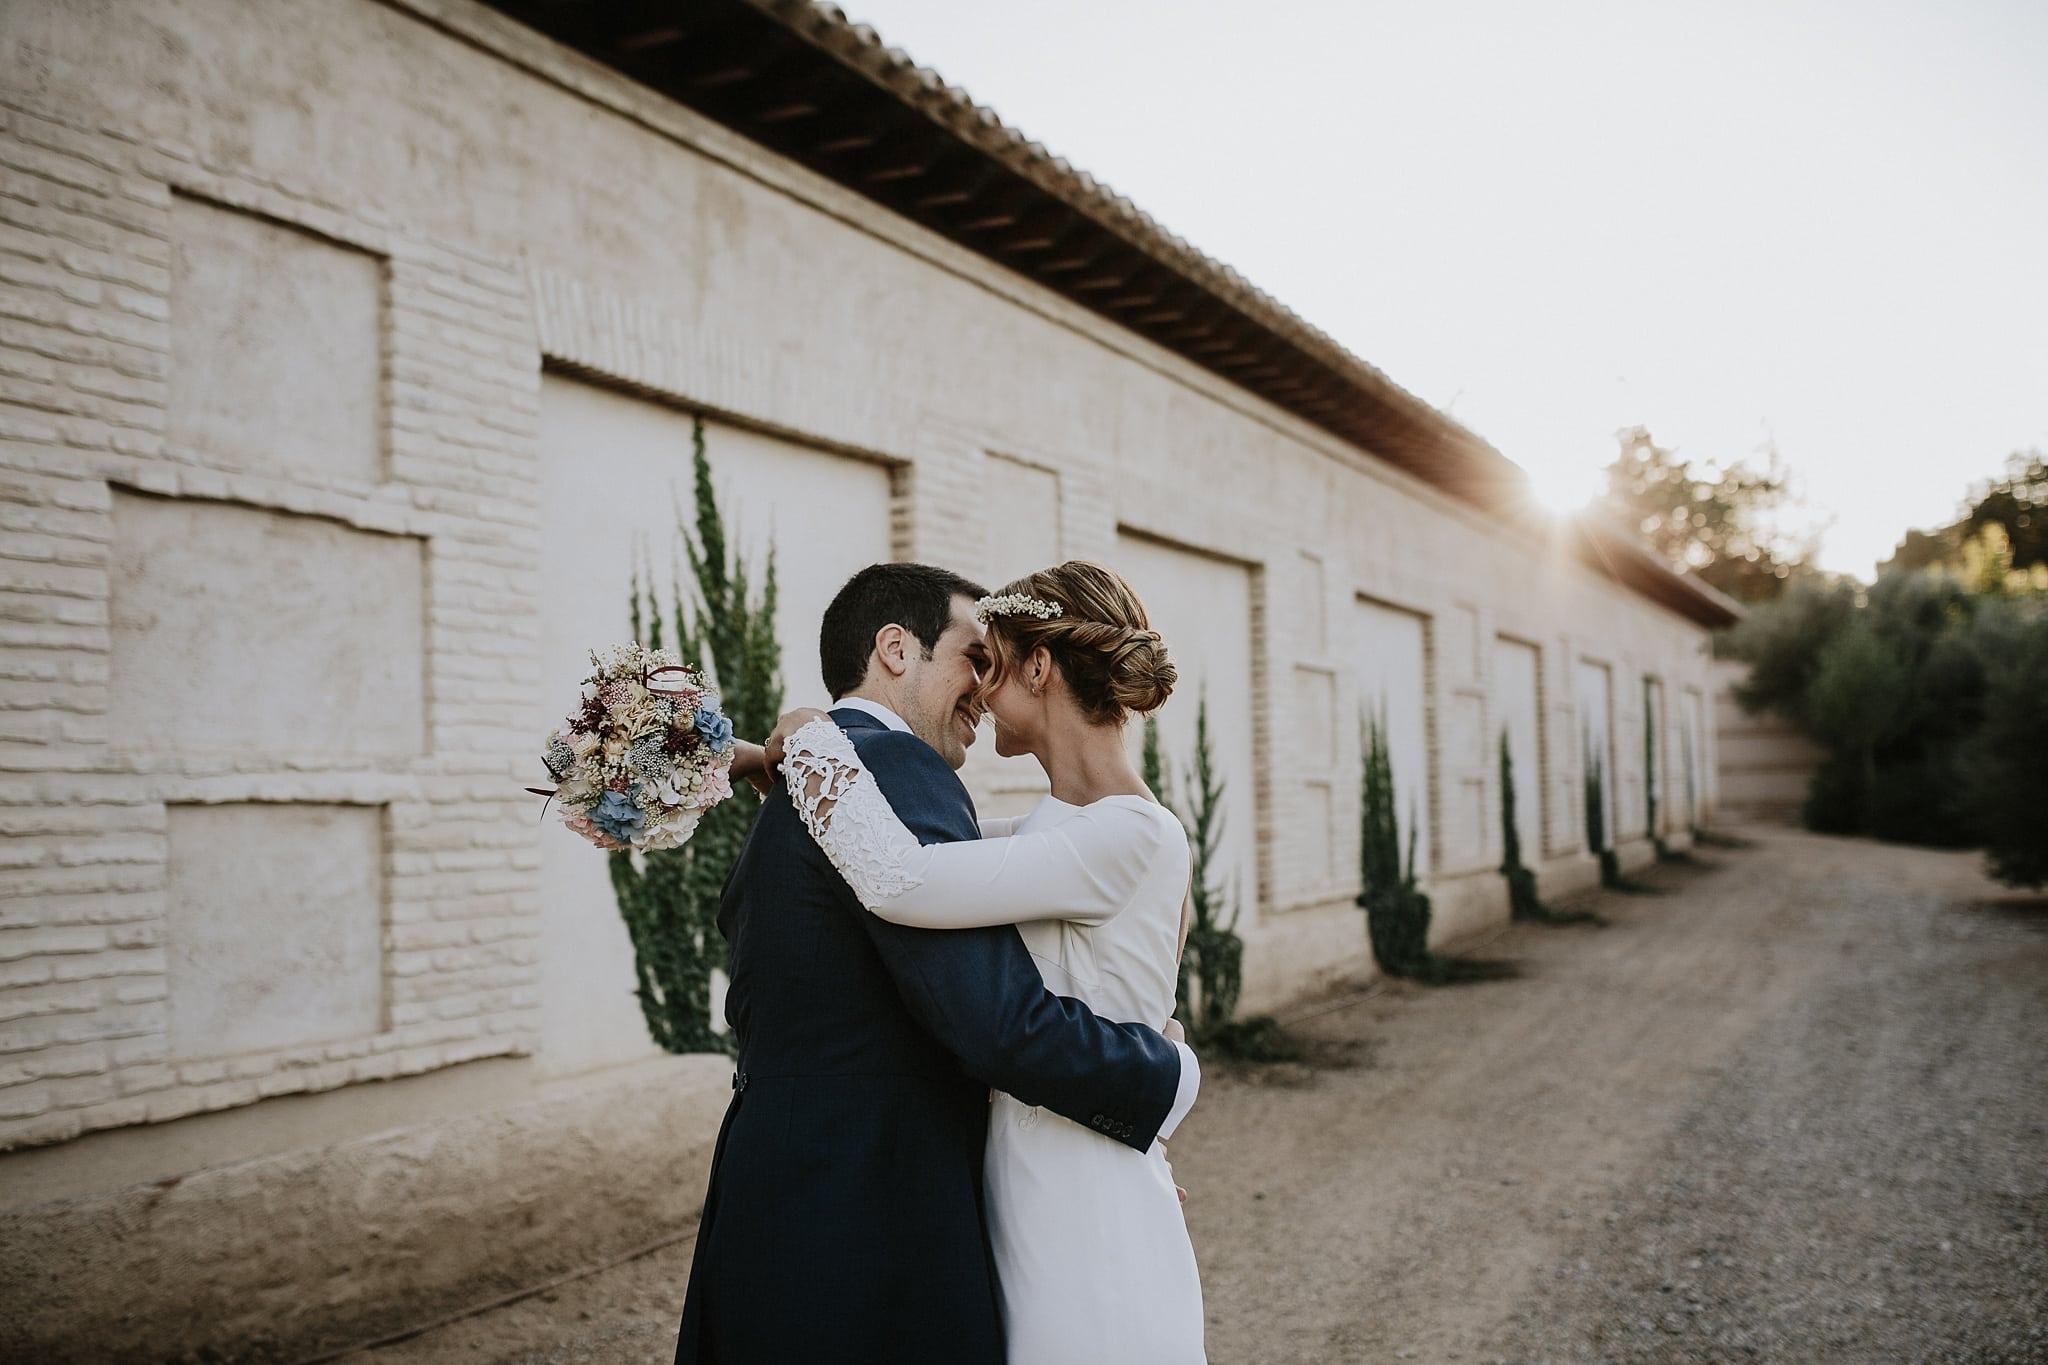 prisma-blanco-fotografos-bodas-toledo-66